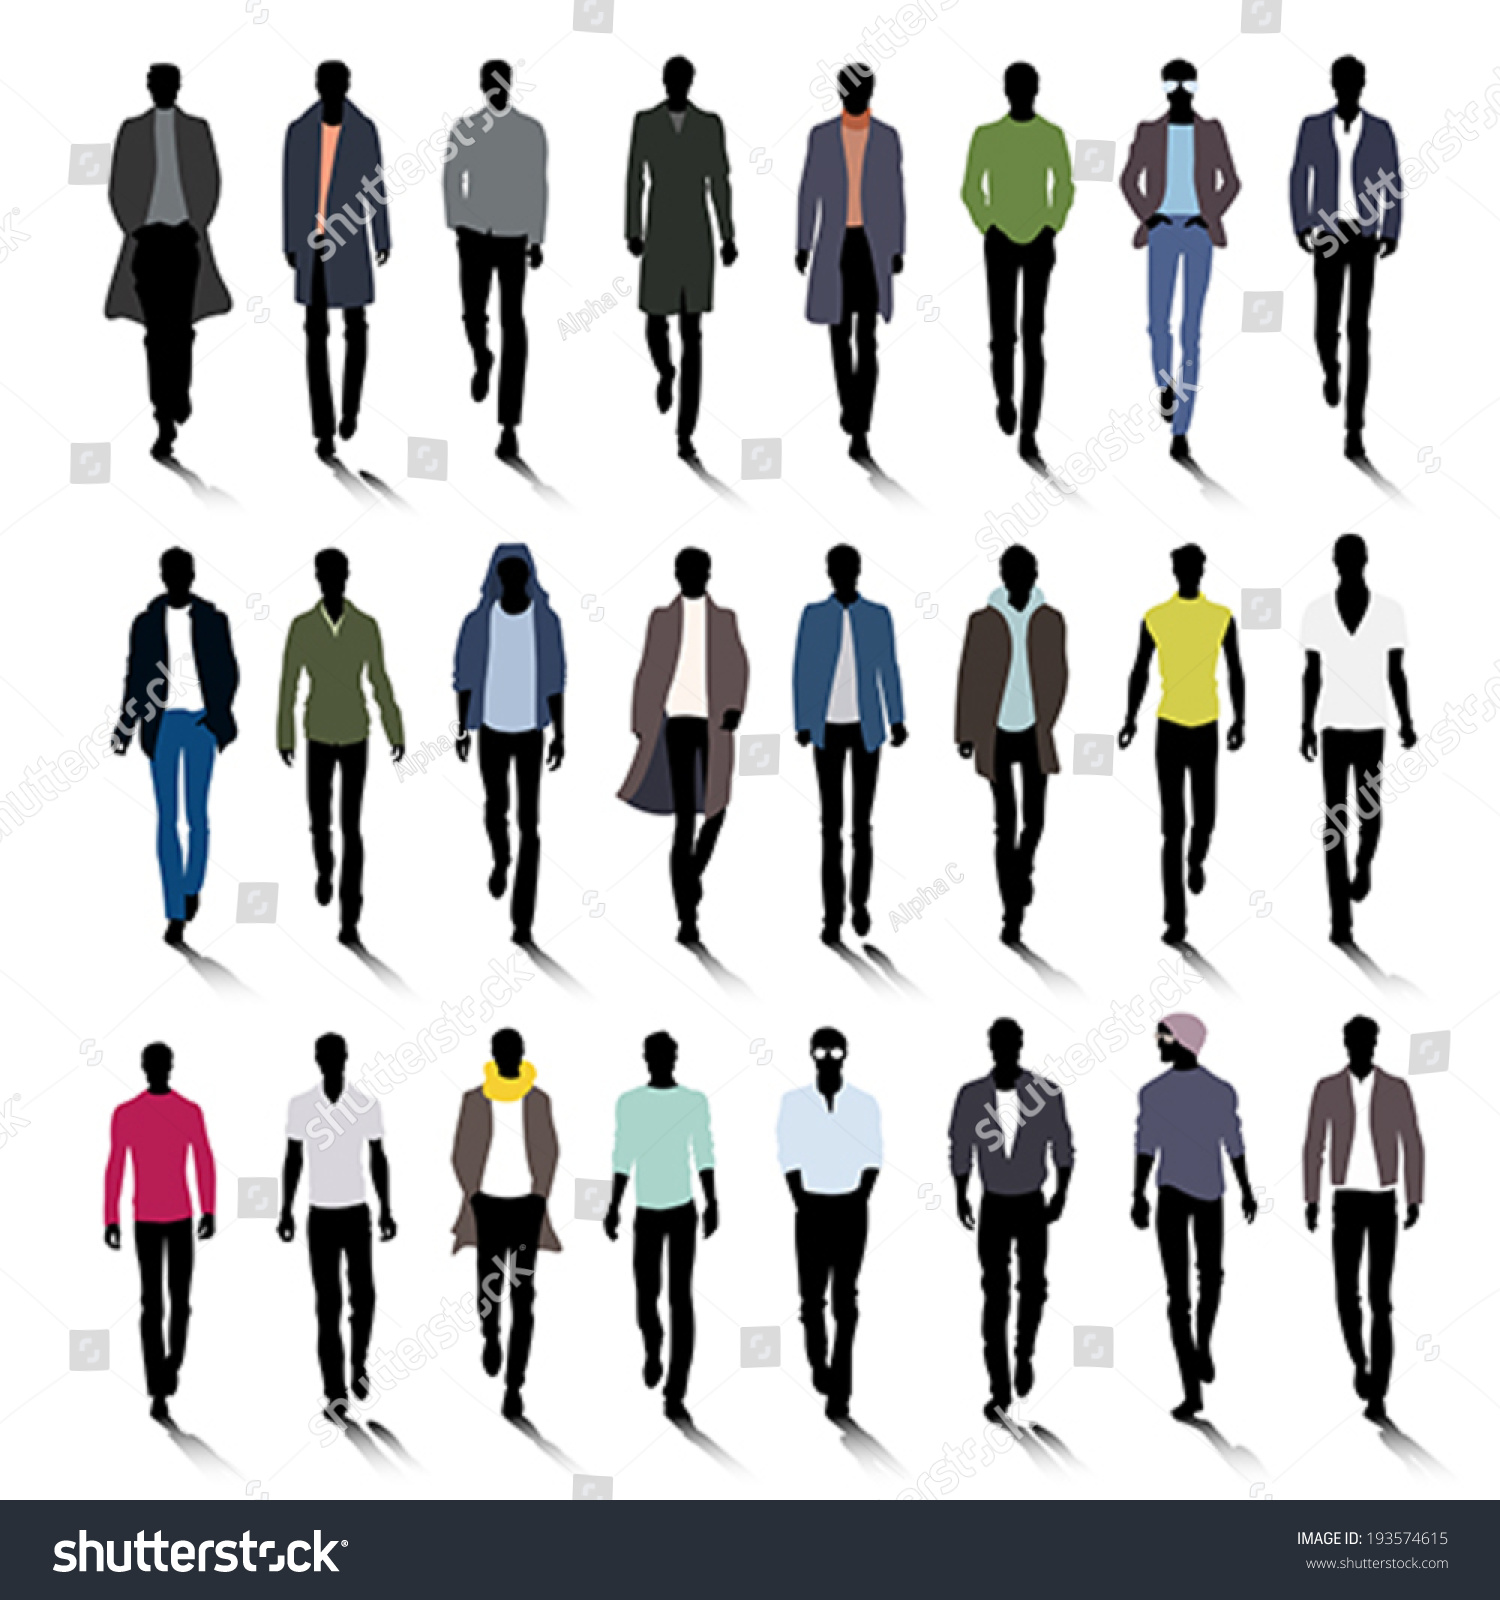 5f61a366fac Set of male fashion silhouettes on runway jpg 1500x1600 Mens fashion  silhouette